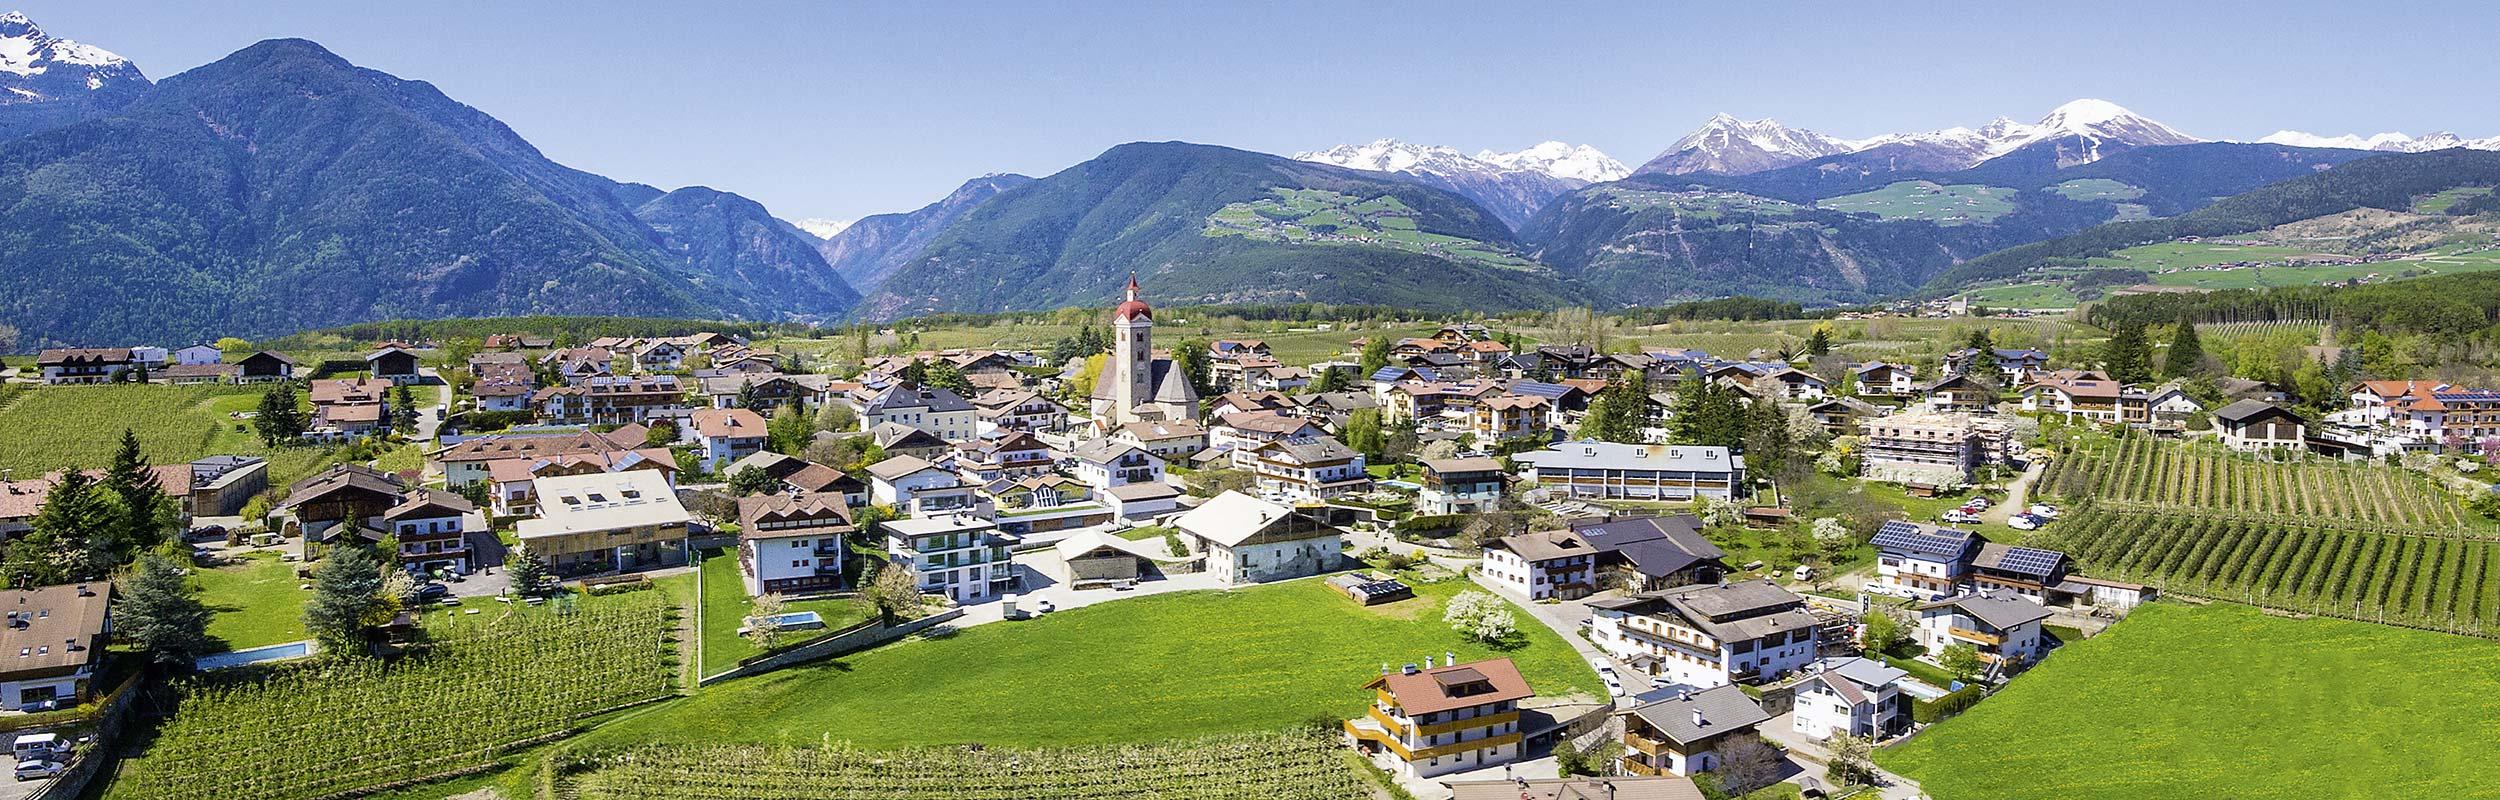 Natz bei Brixen